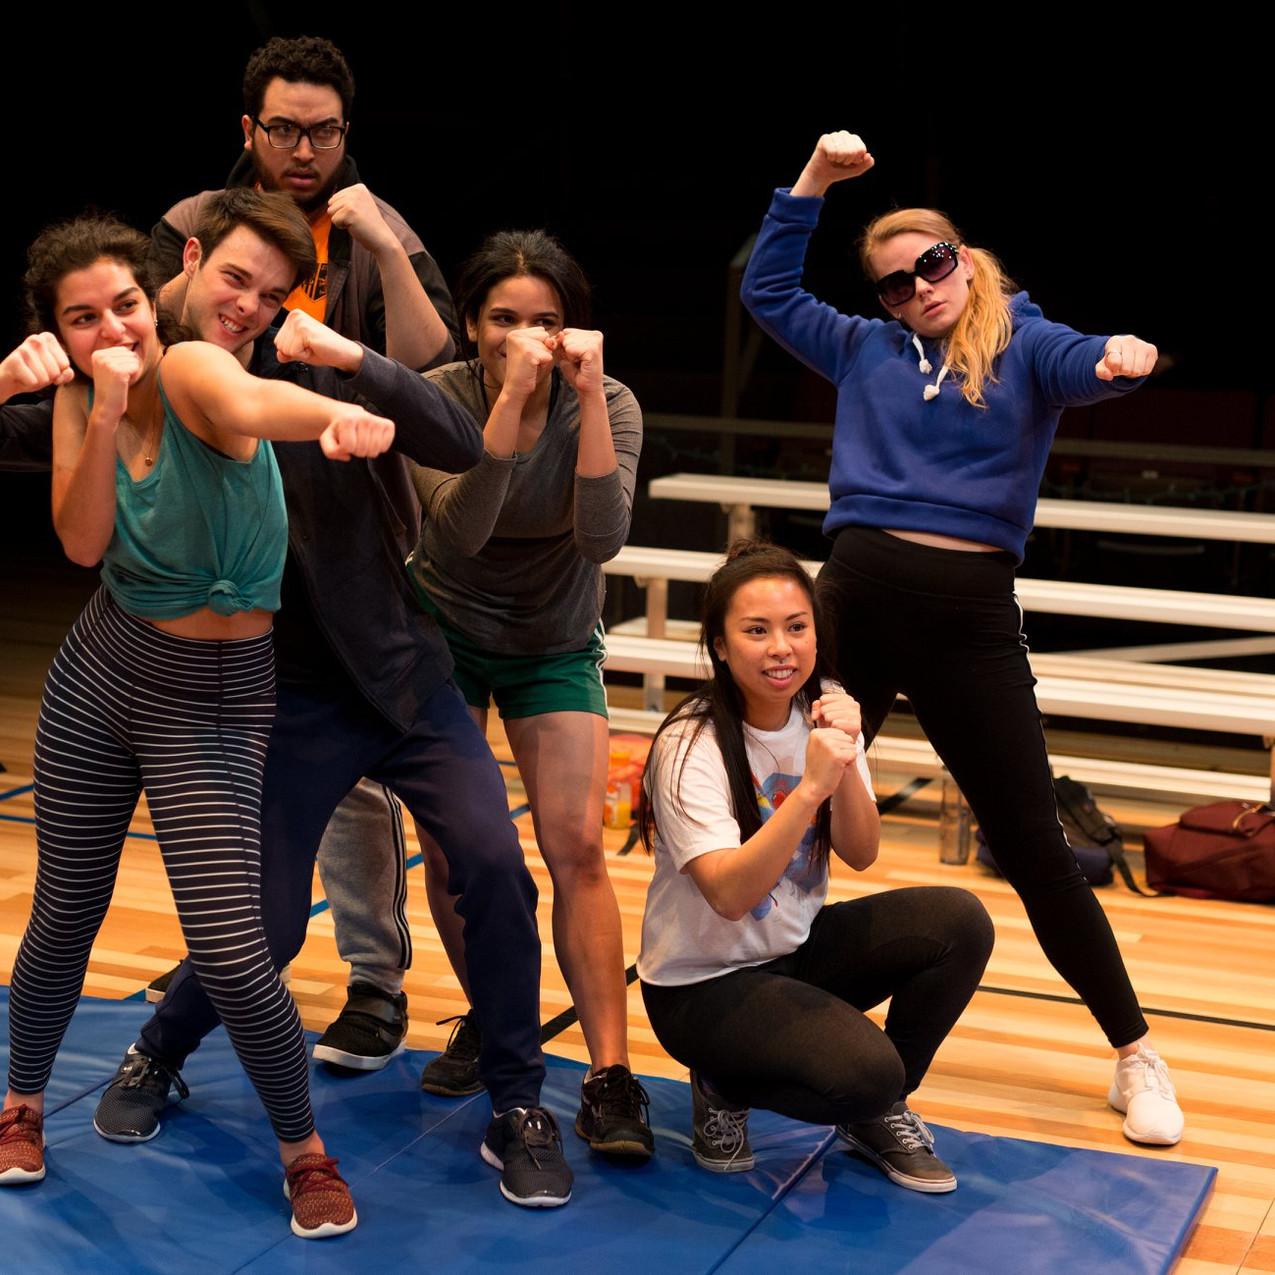 Ariana Mahallati, David Ball, Jonathan Moises Olivares, Gabriela Ortega, Molly Adea, Abby Leigh Huffstetler Photo by Crystal Ludwick